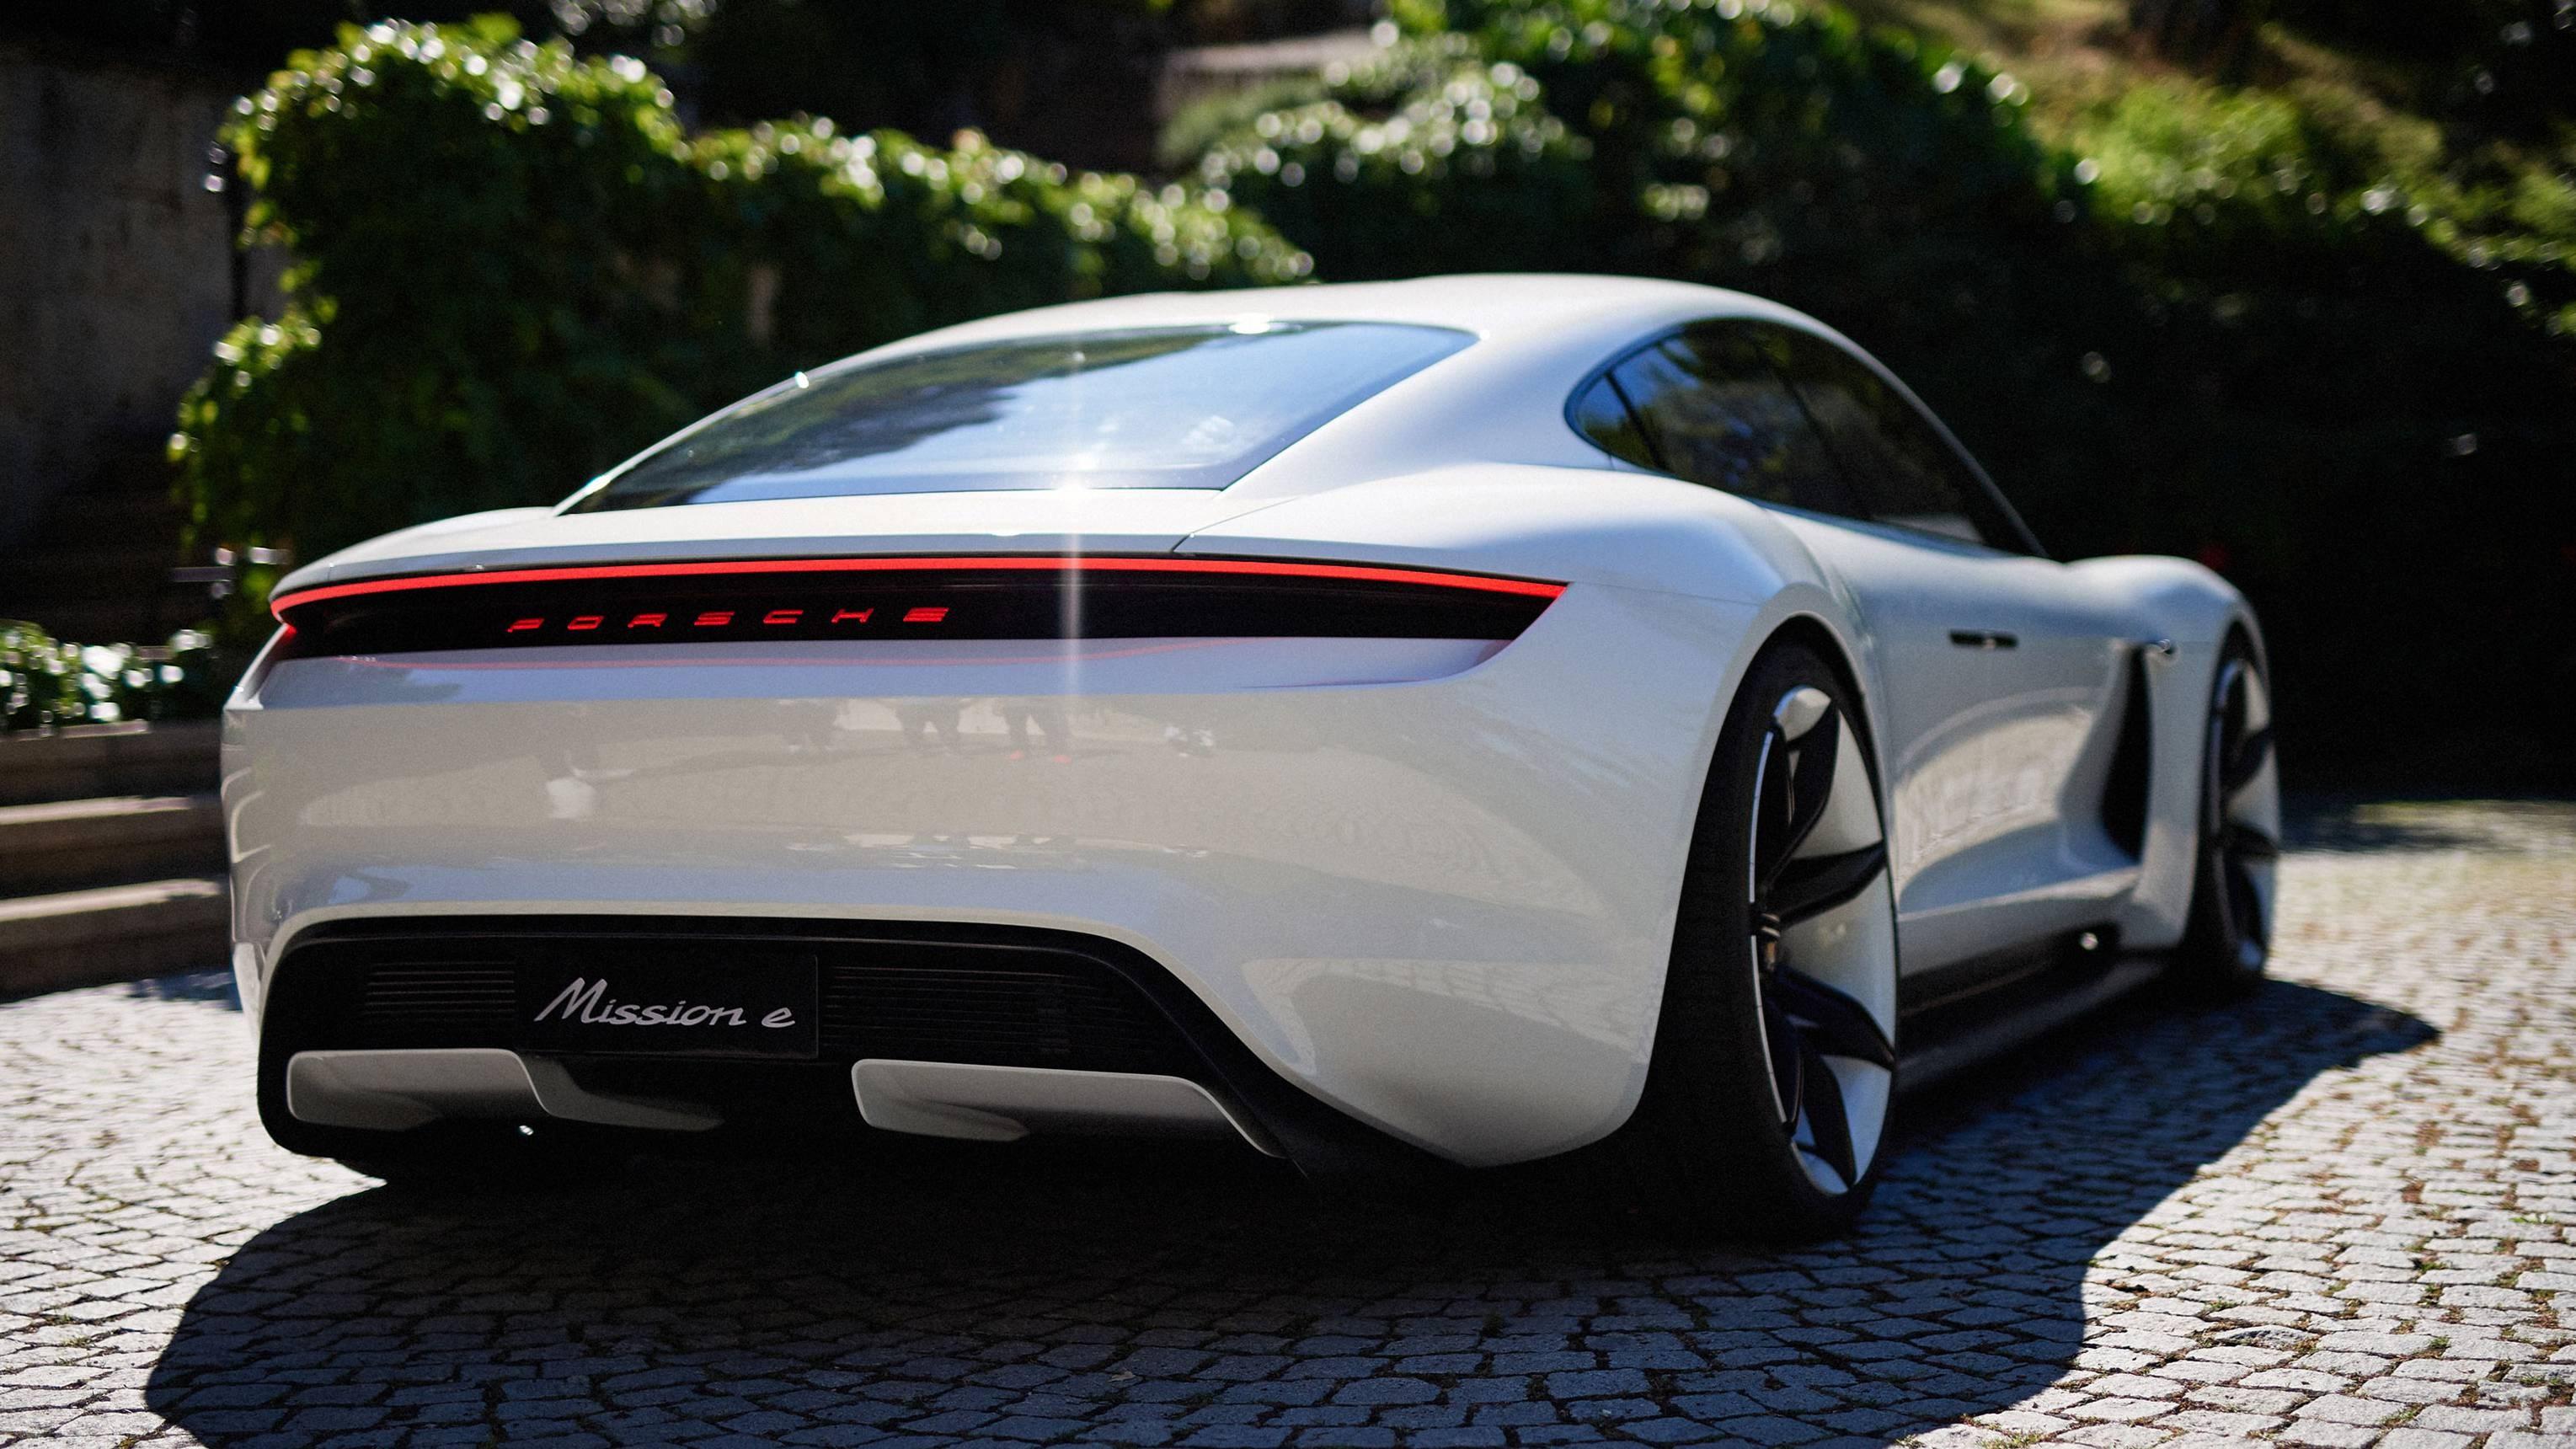 2019 Porsche Taycan To Boast 447kW, Over 500km Range Thumbnail